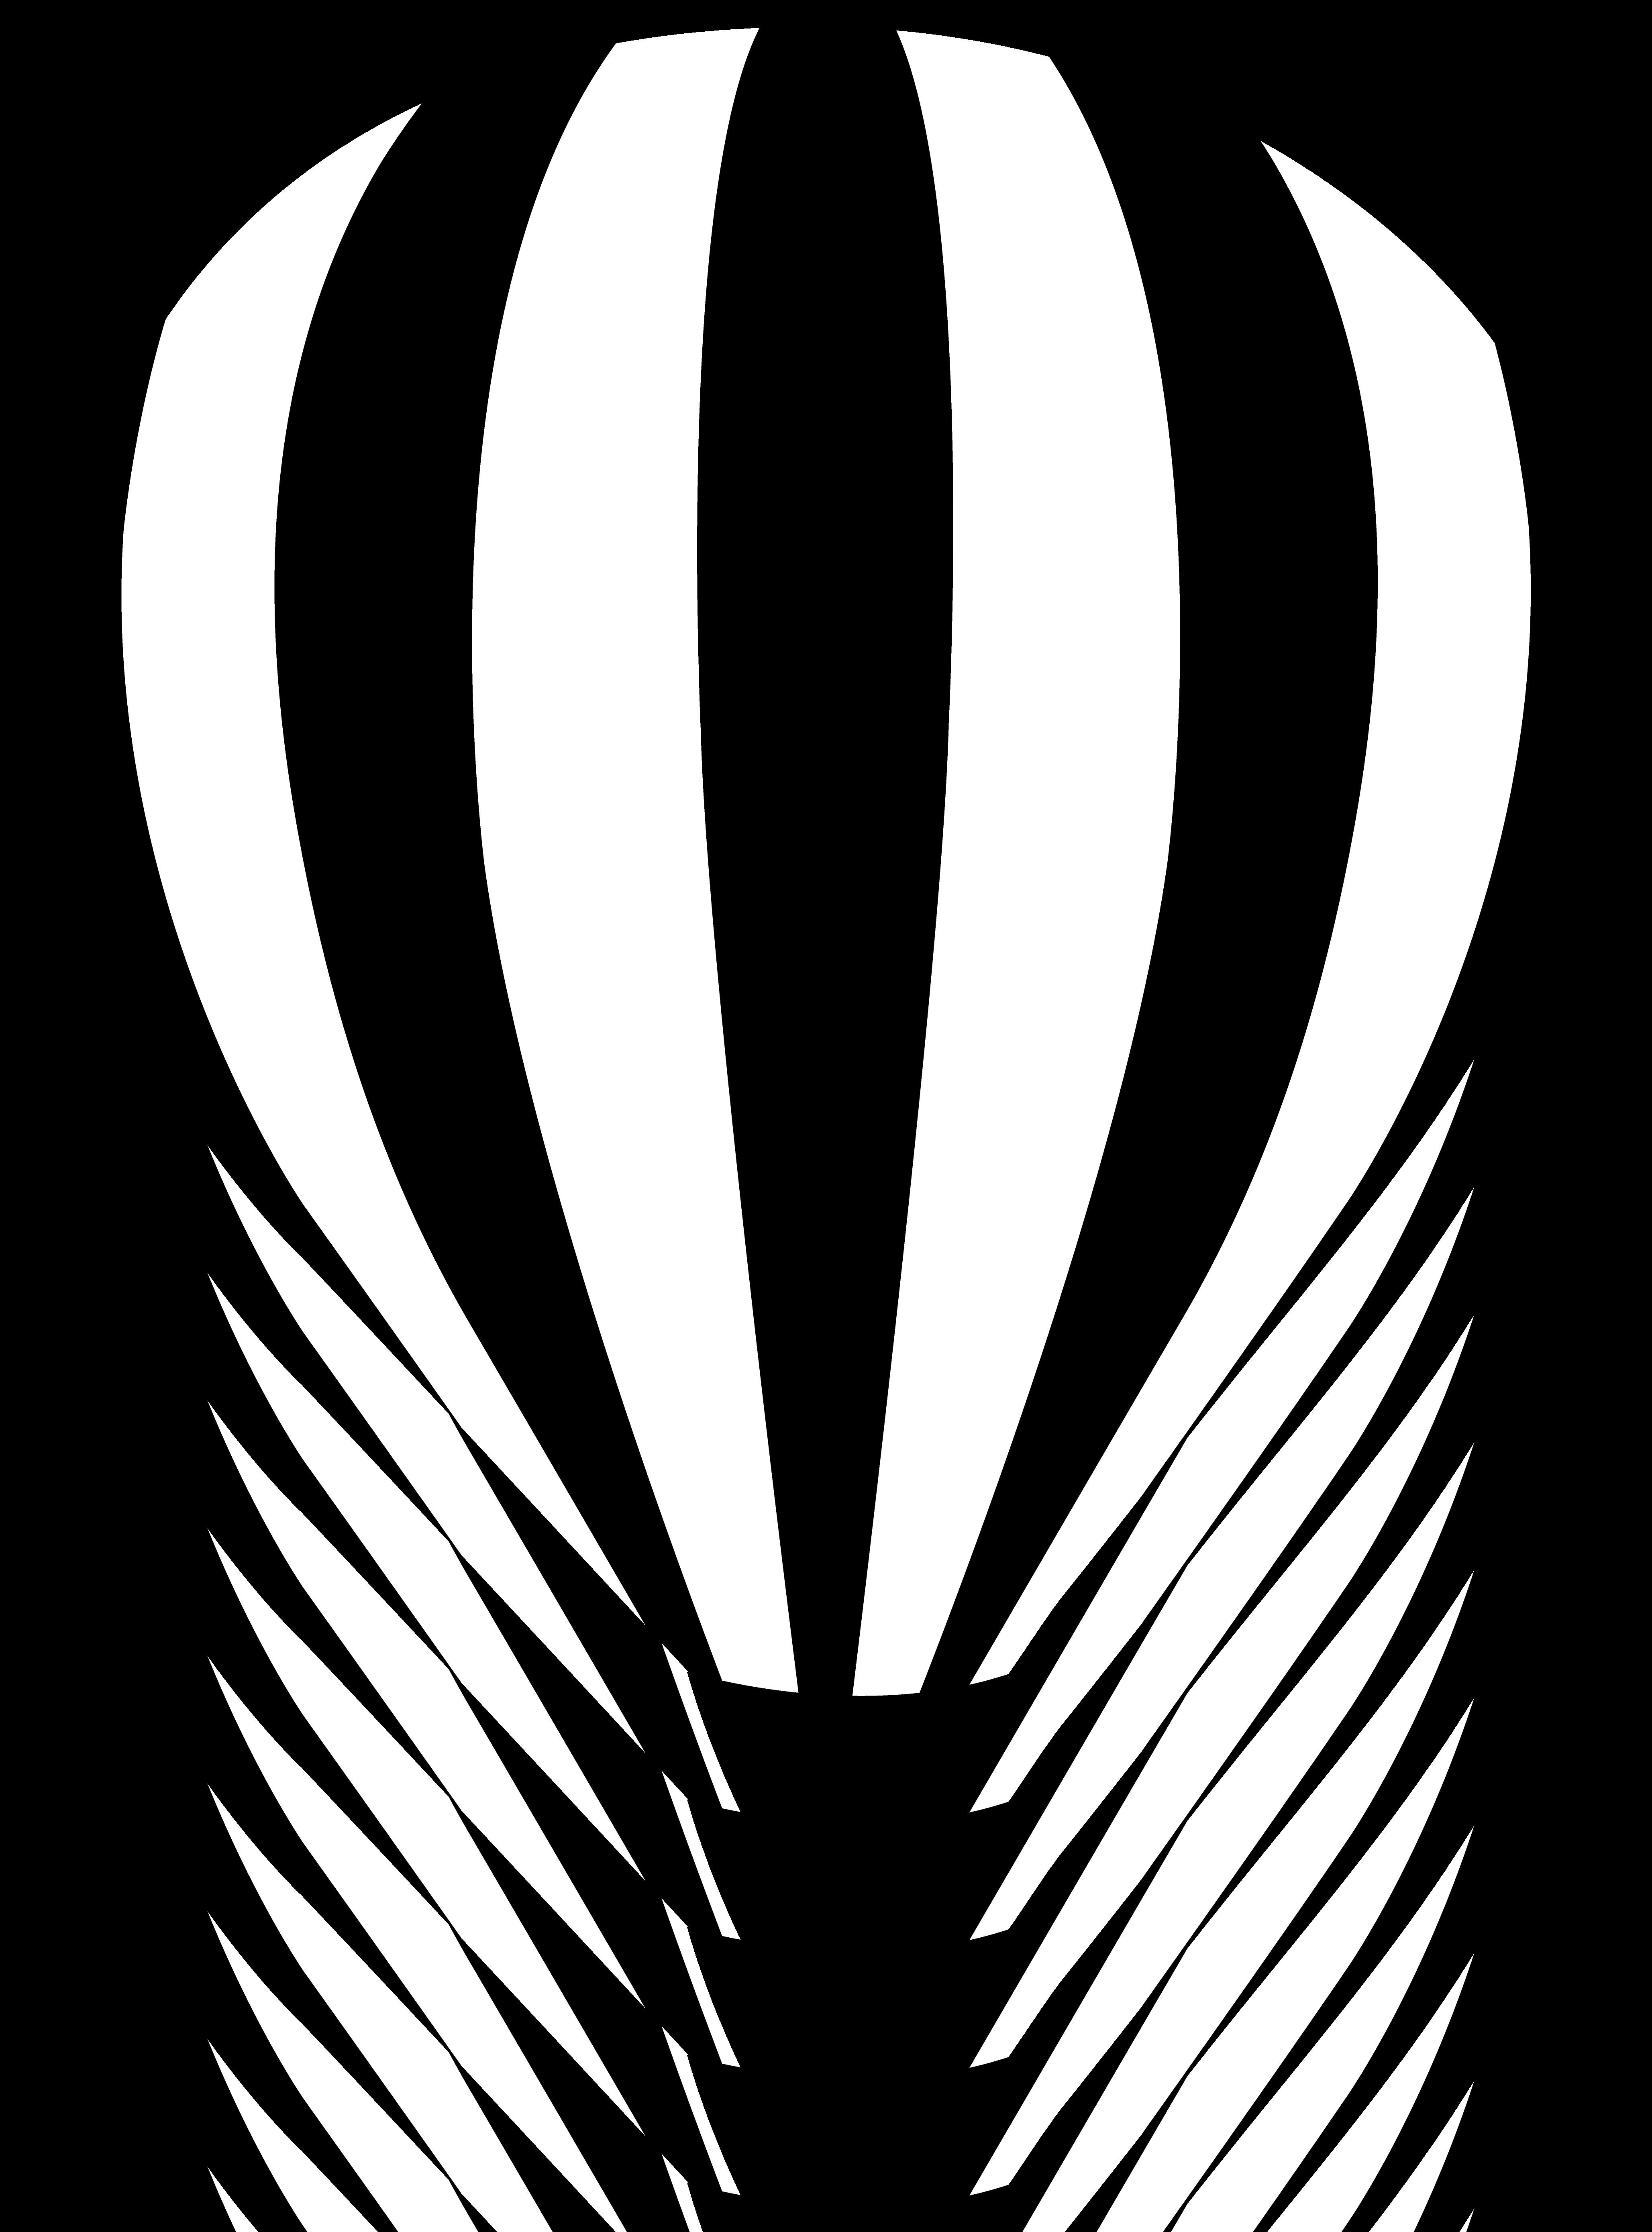 Hot Air Balloon clipart #5, Download drawings